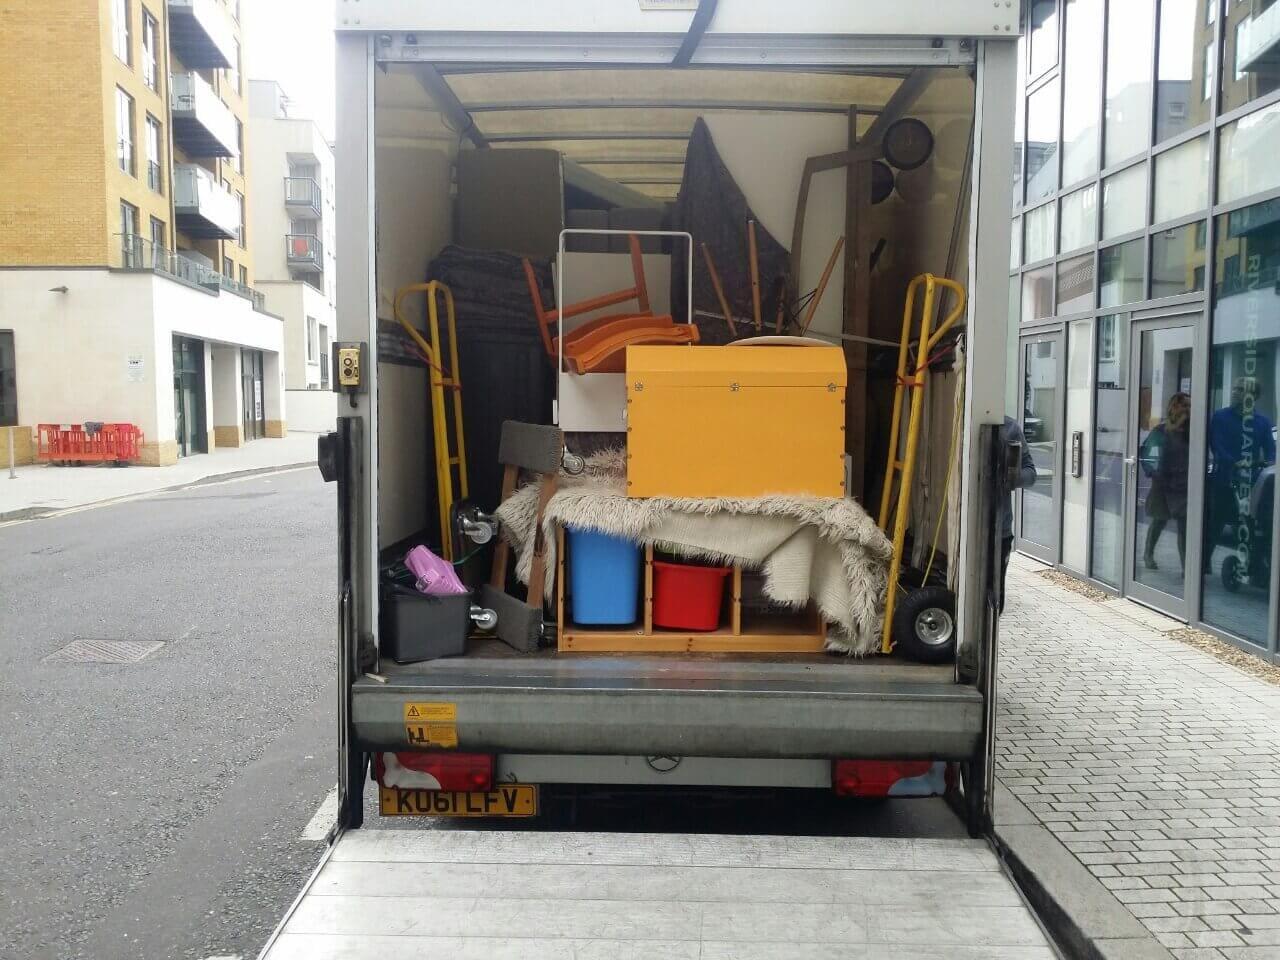 Mottingham van with man SE9